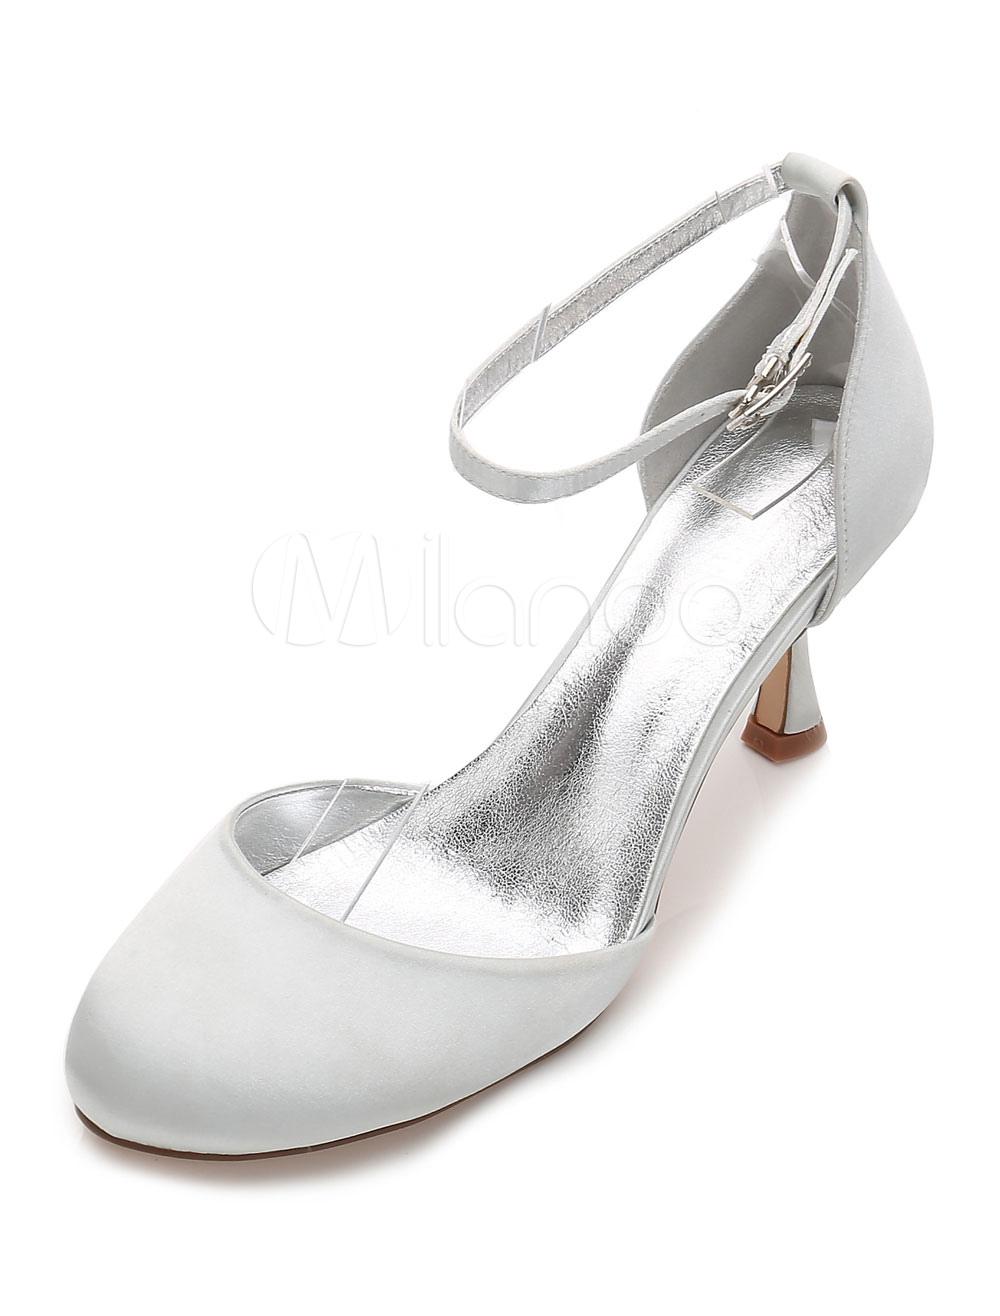 Zapatos de puntera redonda Tacón bobina de seda y satén elegantes Fiesta de bodas CPeUXr